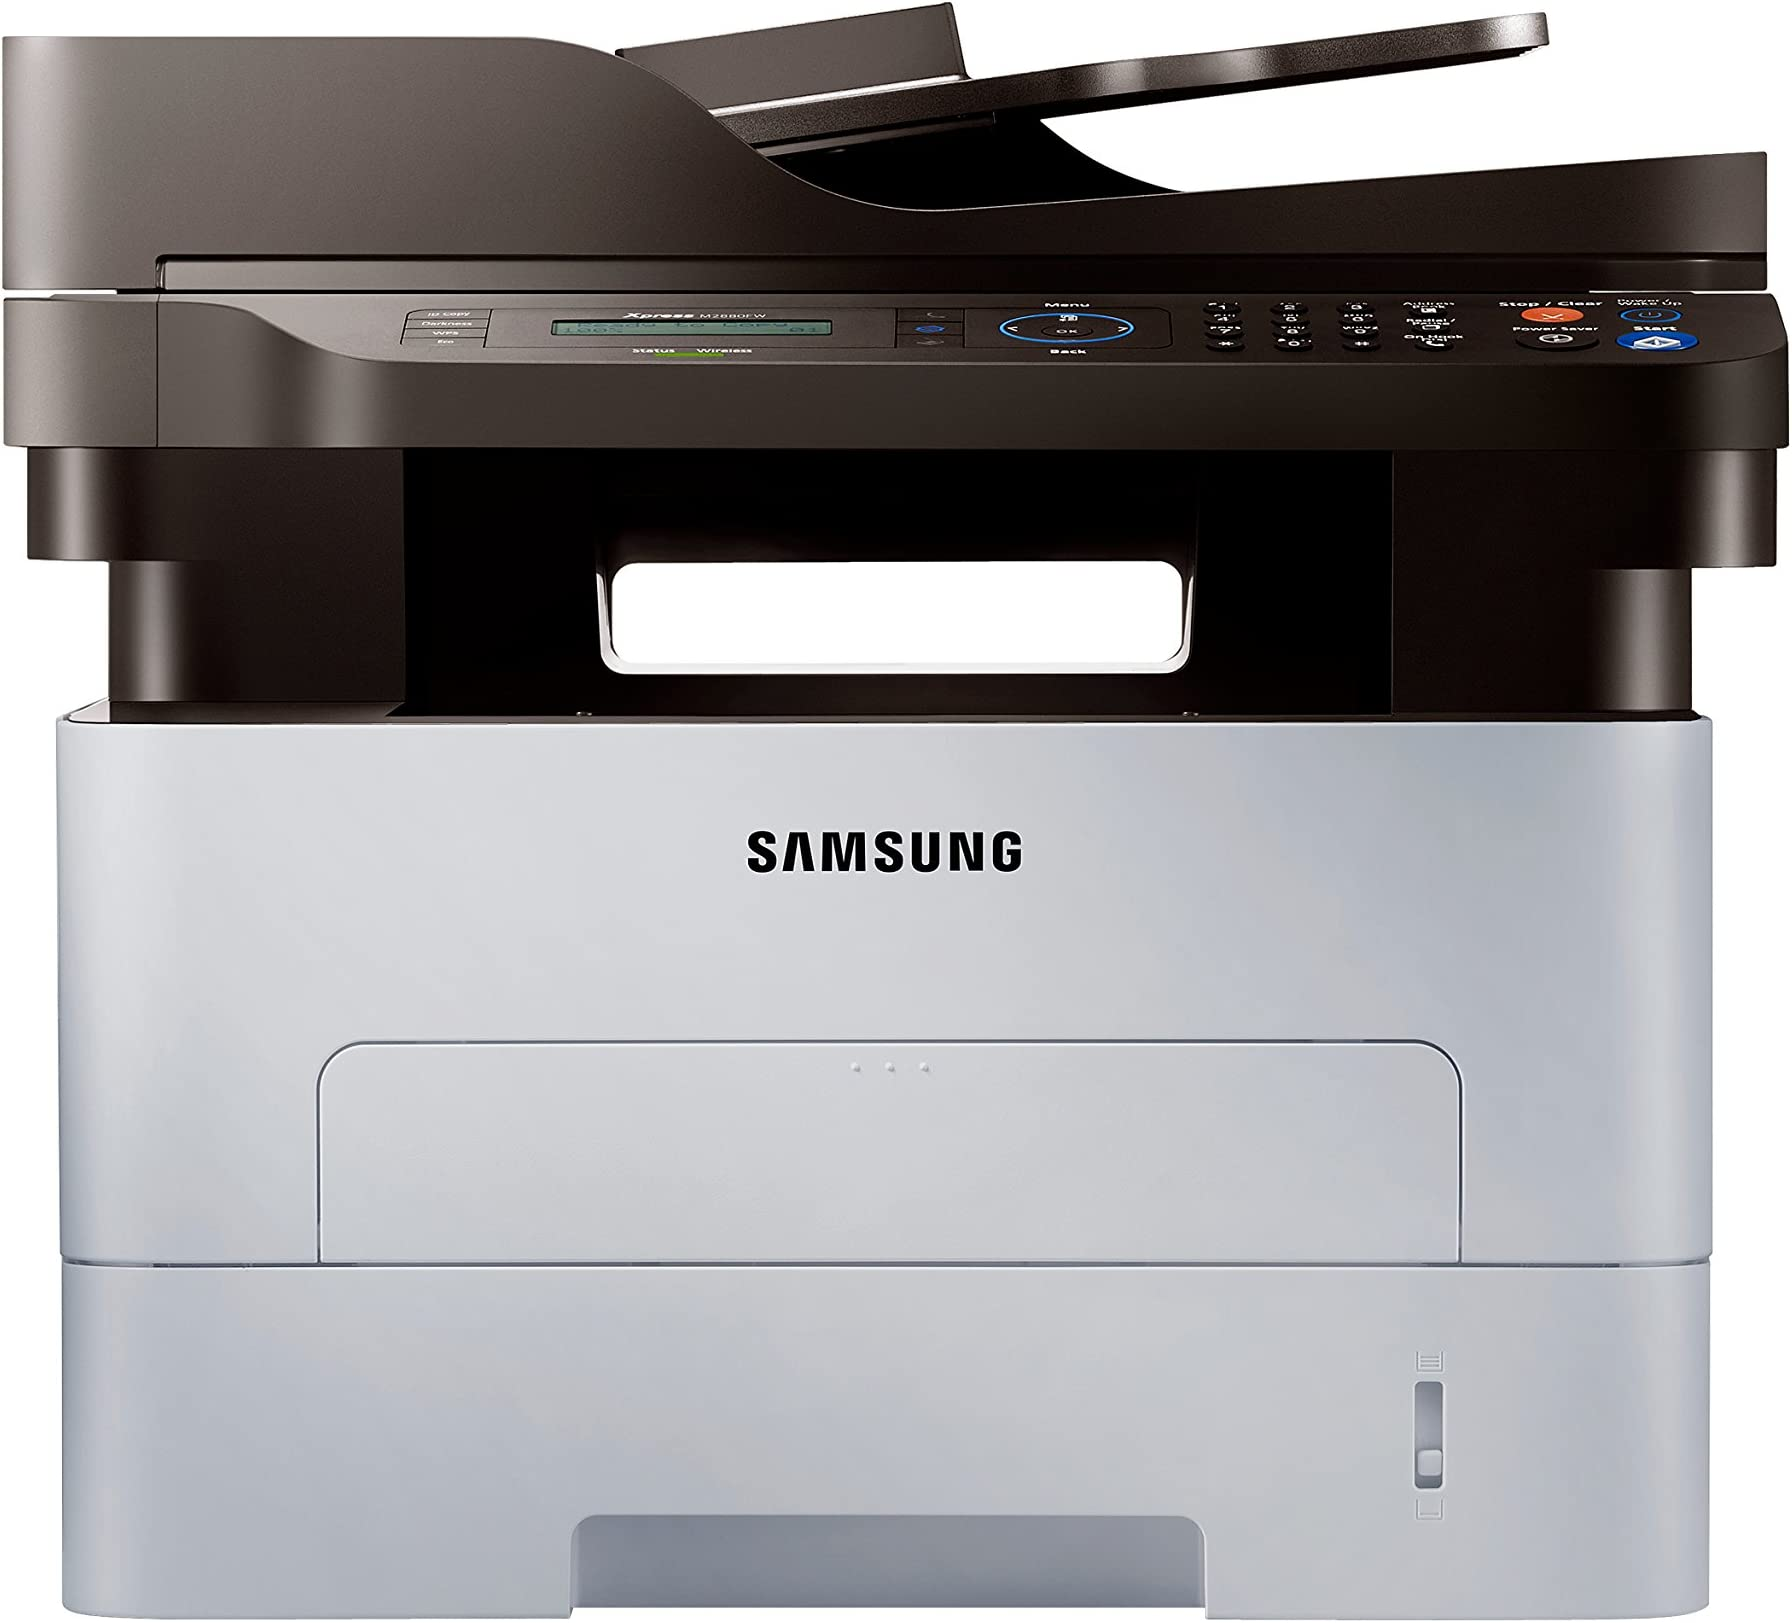 Samsung SL-M2880FW/XAC Wireless Mono Laser Printer with Scanner, Copier and Fax